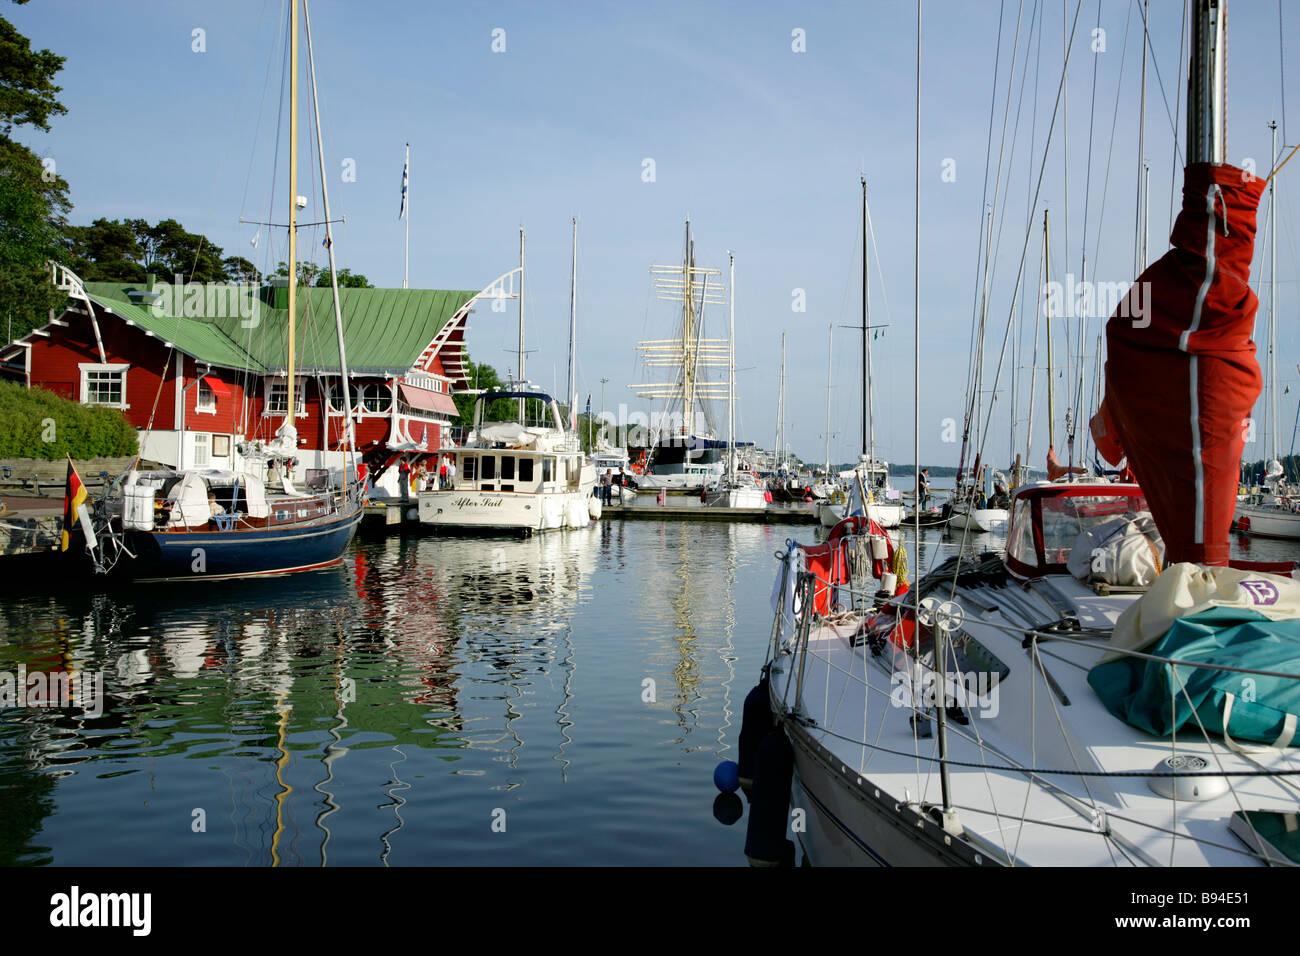 West Harbor in Maarianhamina, Aland Stock Photo